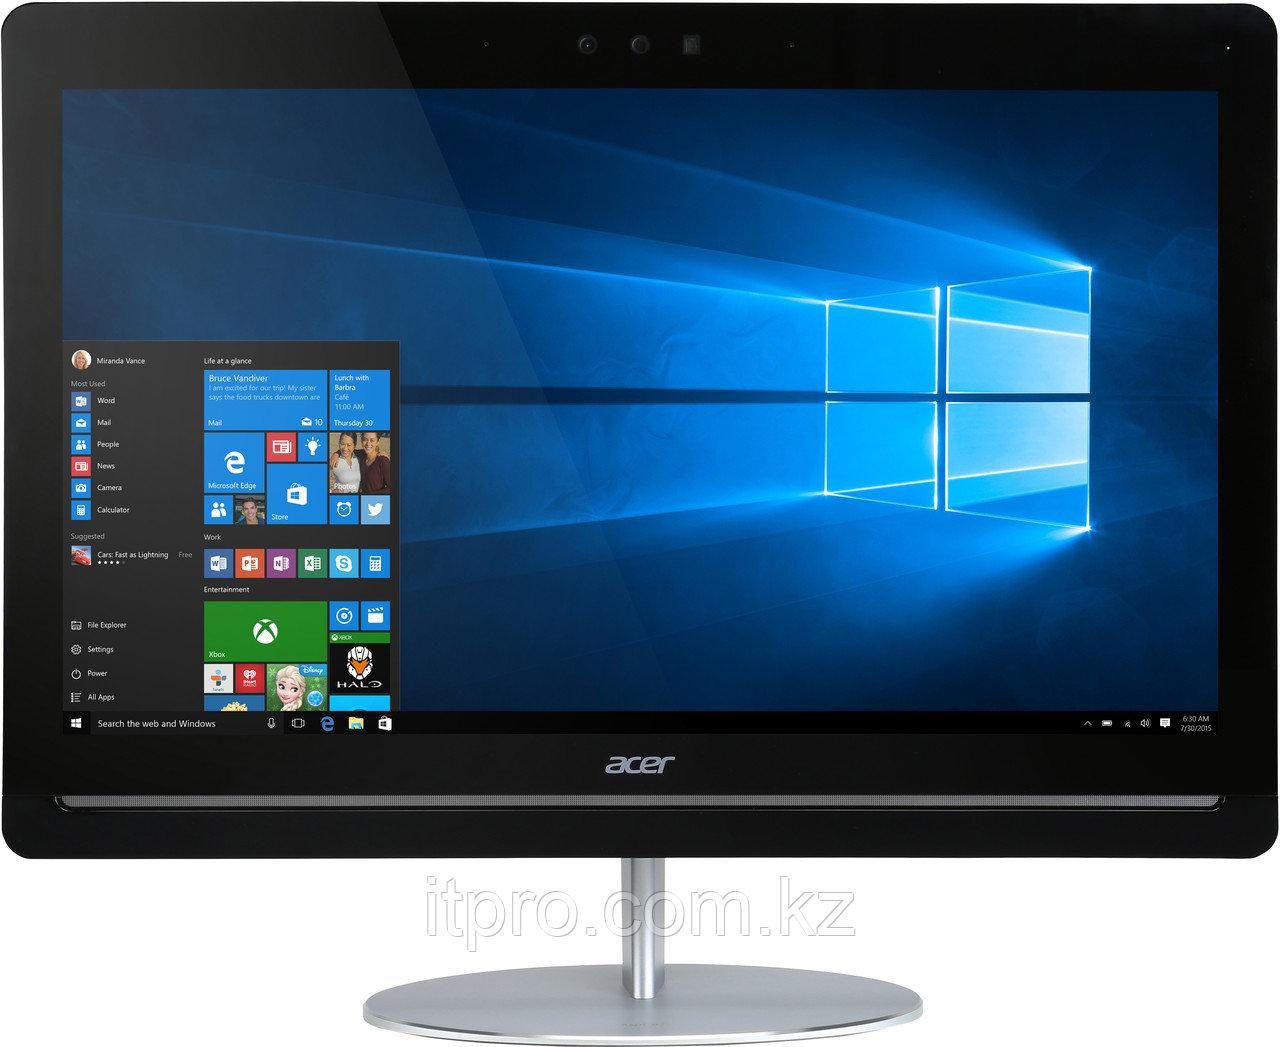 Моноблок Acer Aspire U5-710